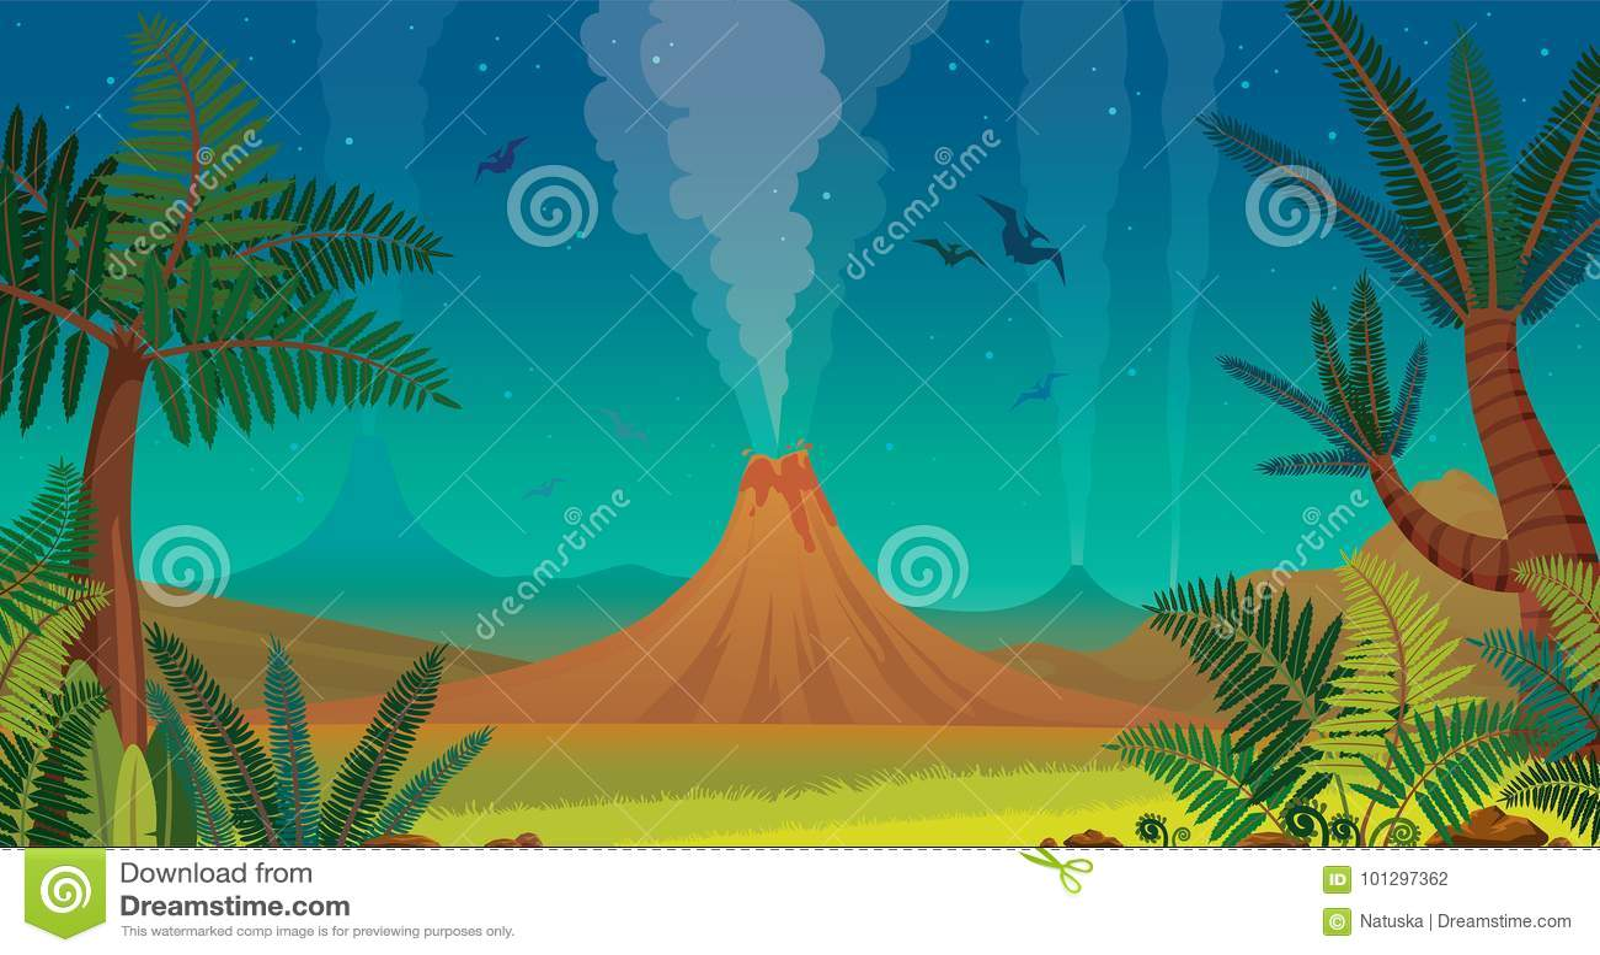 Prehistoric Nature Volcano Pterodactyl Fern Night Sky Prehistoric Landscape Active Volcanoes Green Ferns Silhouette